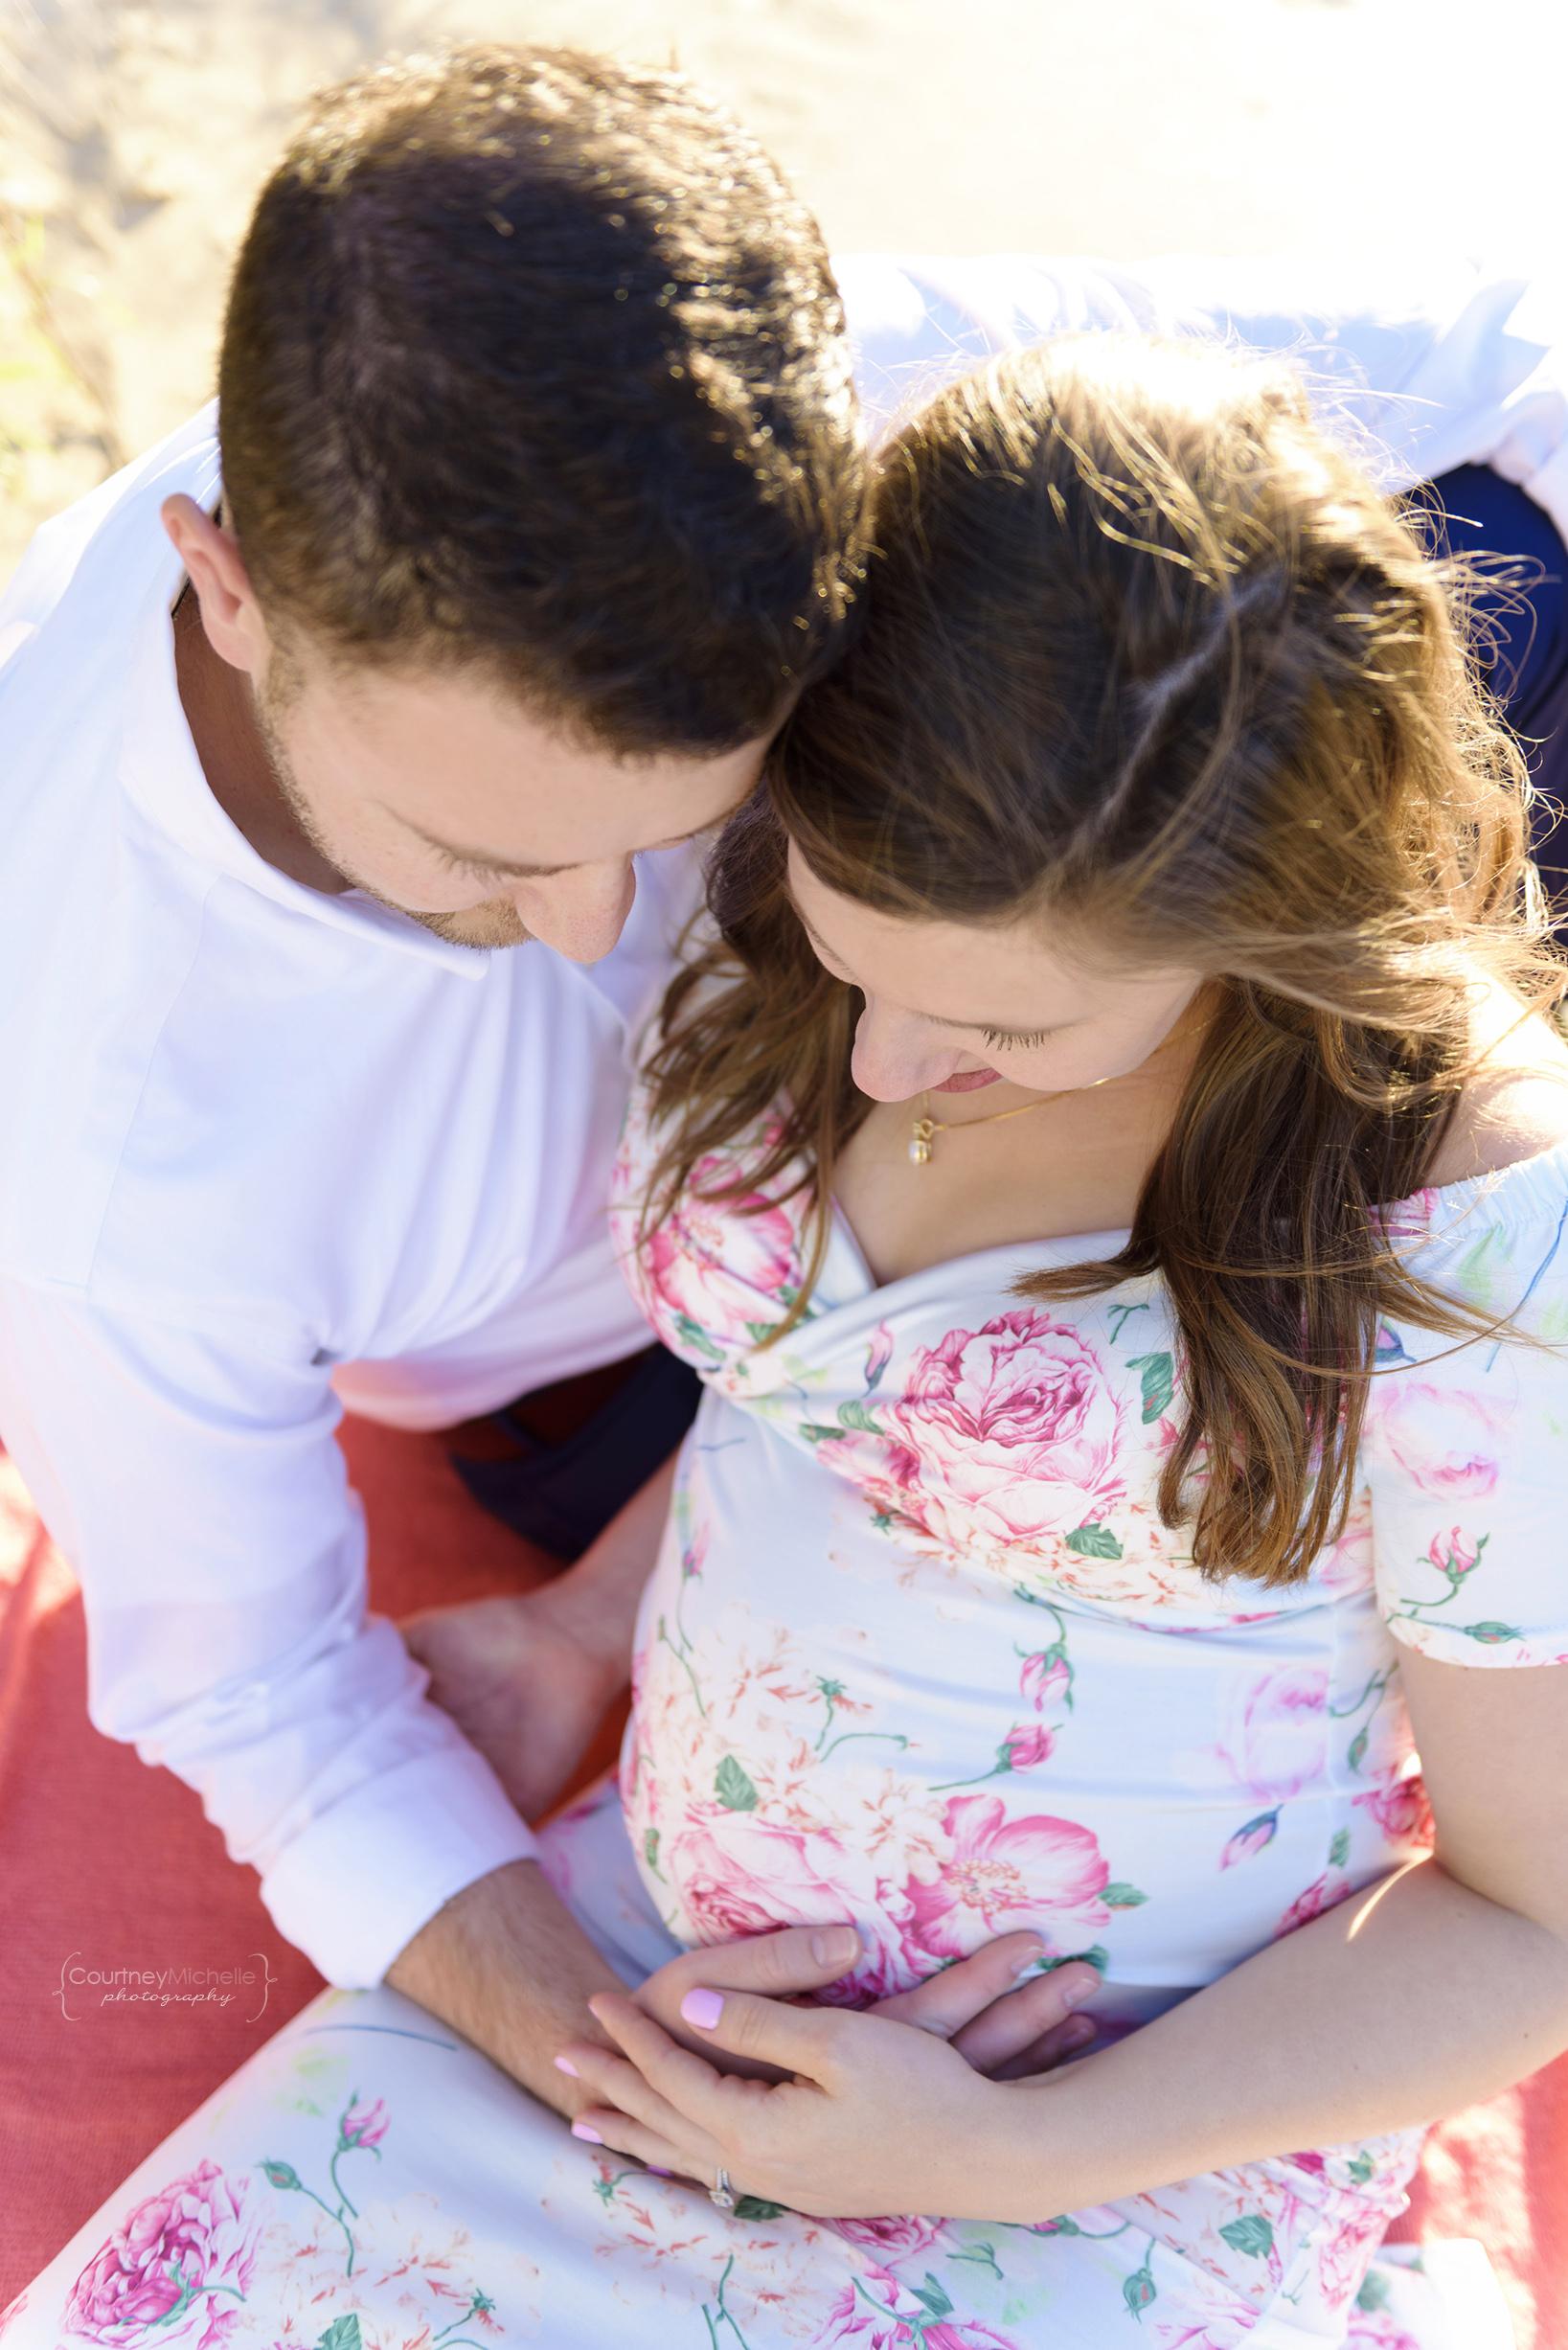 montrose-beach-chicago-maternity-session-courtney-laper©COPYRIGHTCMP-Maternity-3046-edit.jpg